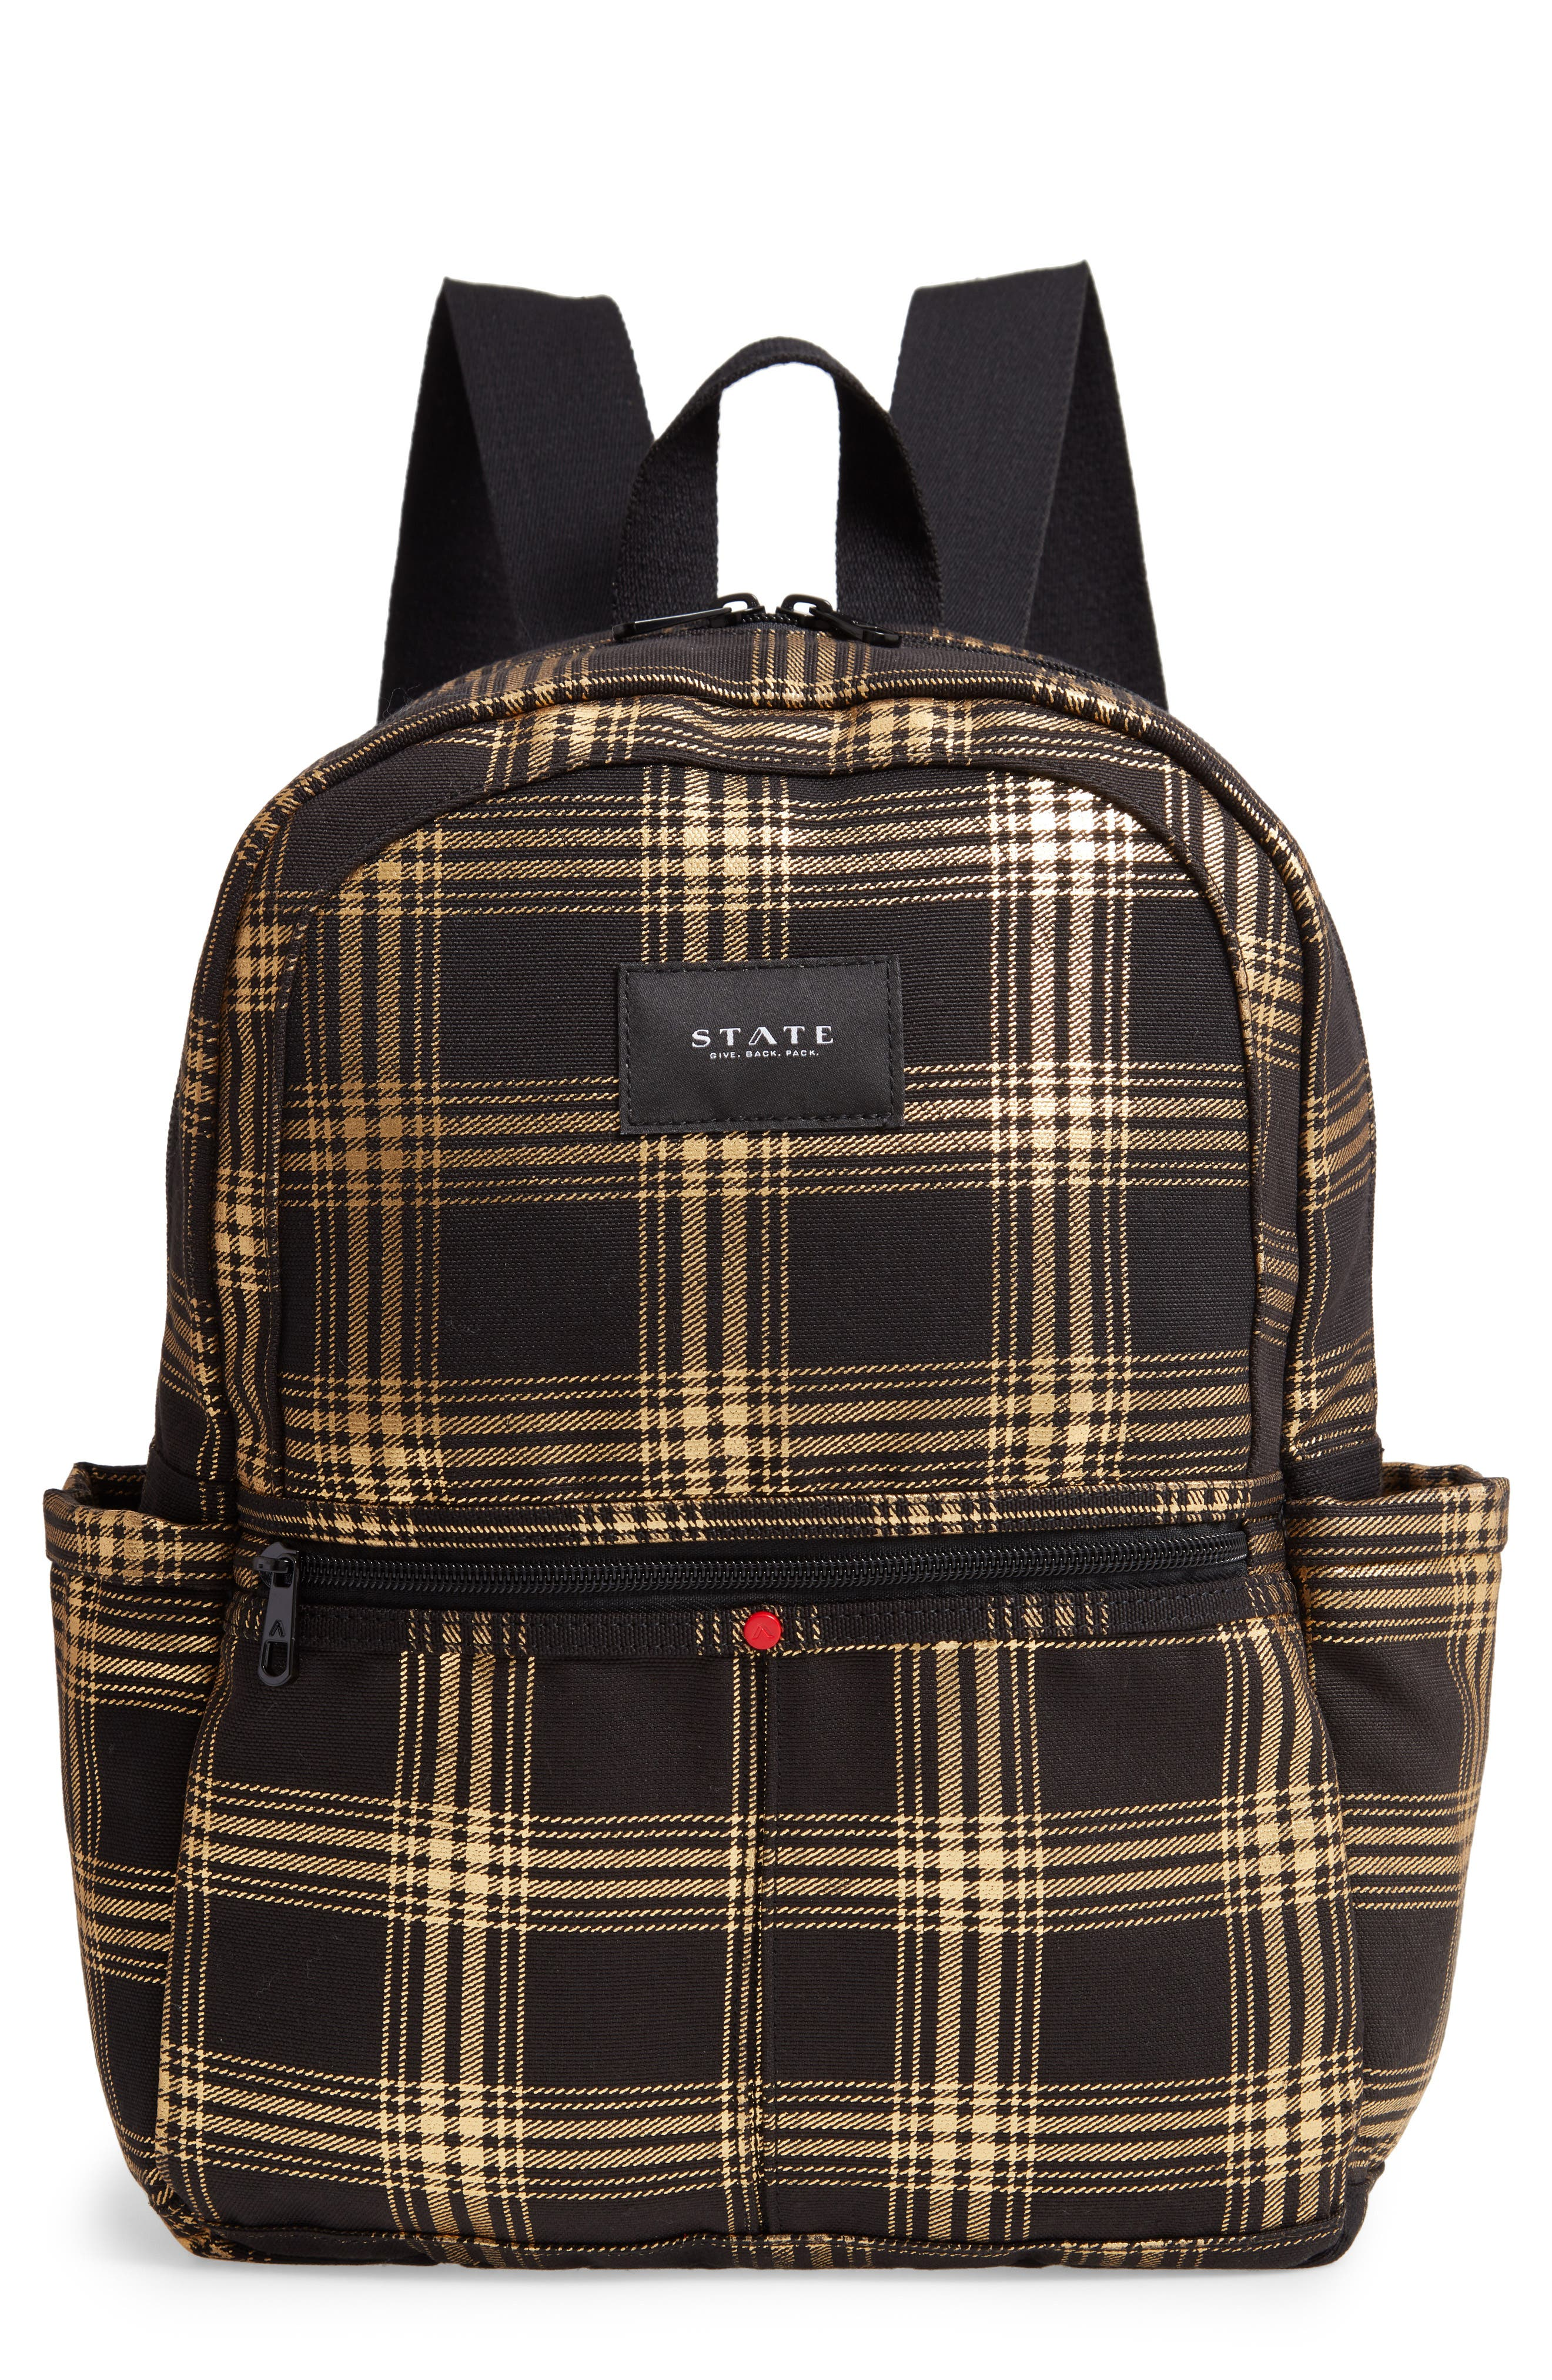 STATE Kane Metallic Plaid Backpack - Black